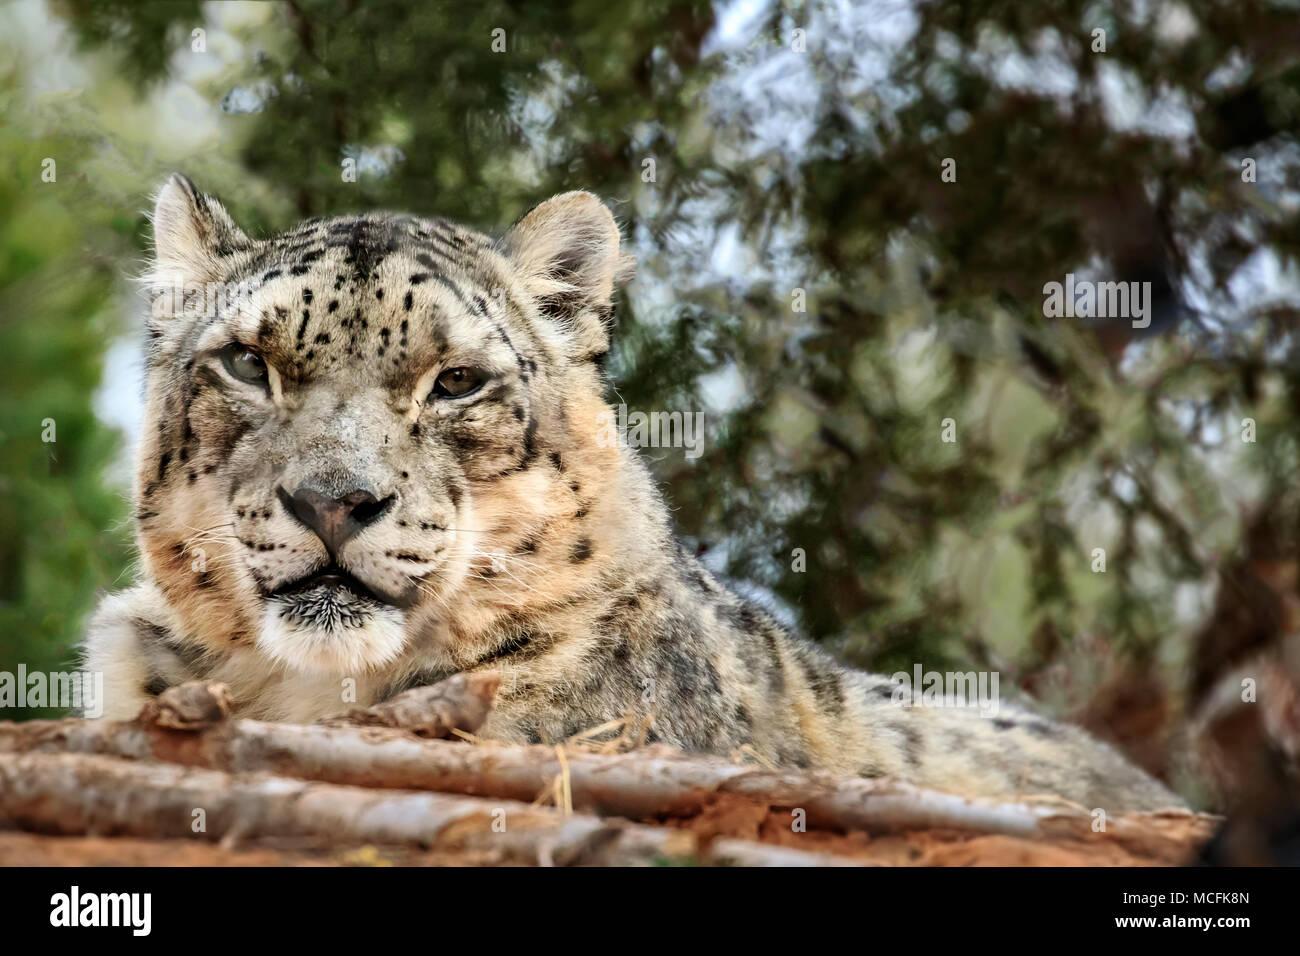 Snow Leopard (Panthera uncia) Portrait. Stockbild